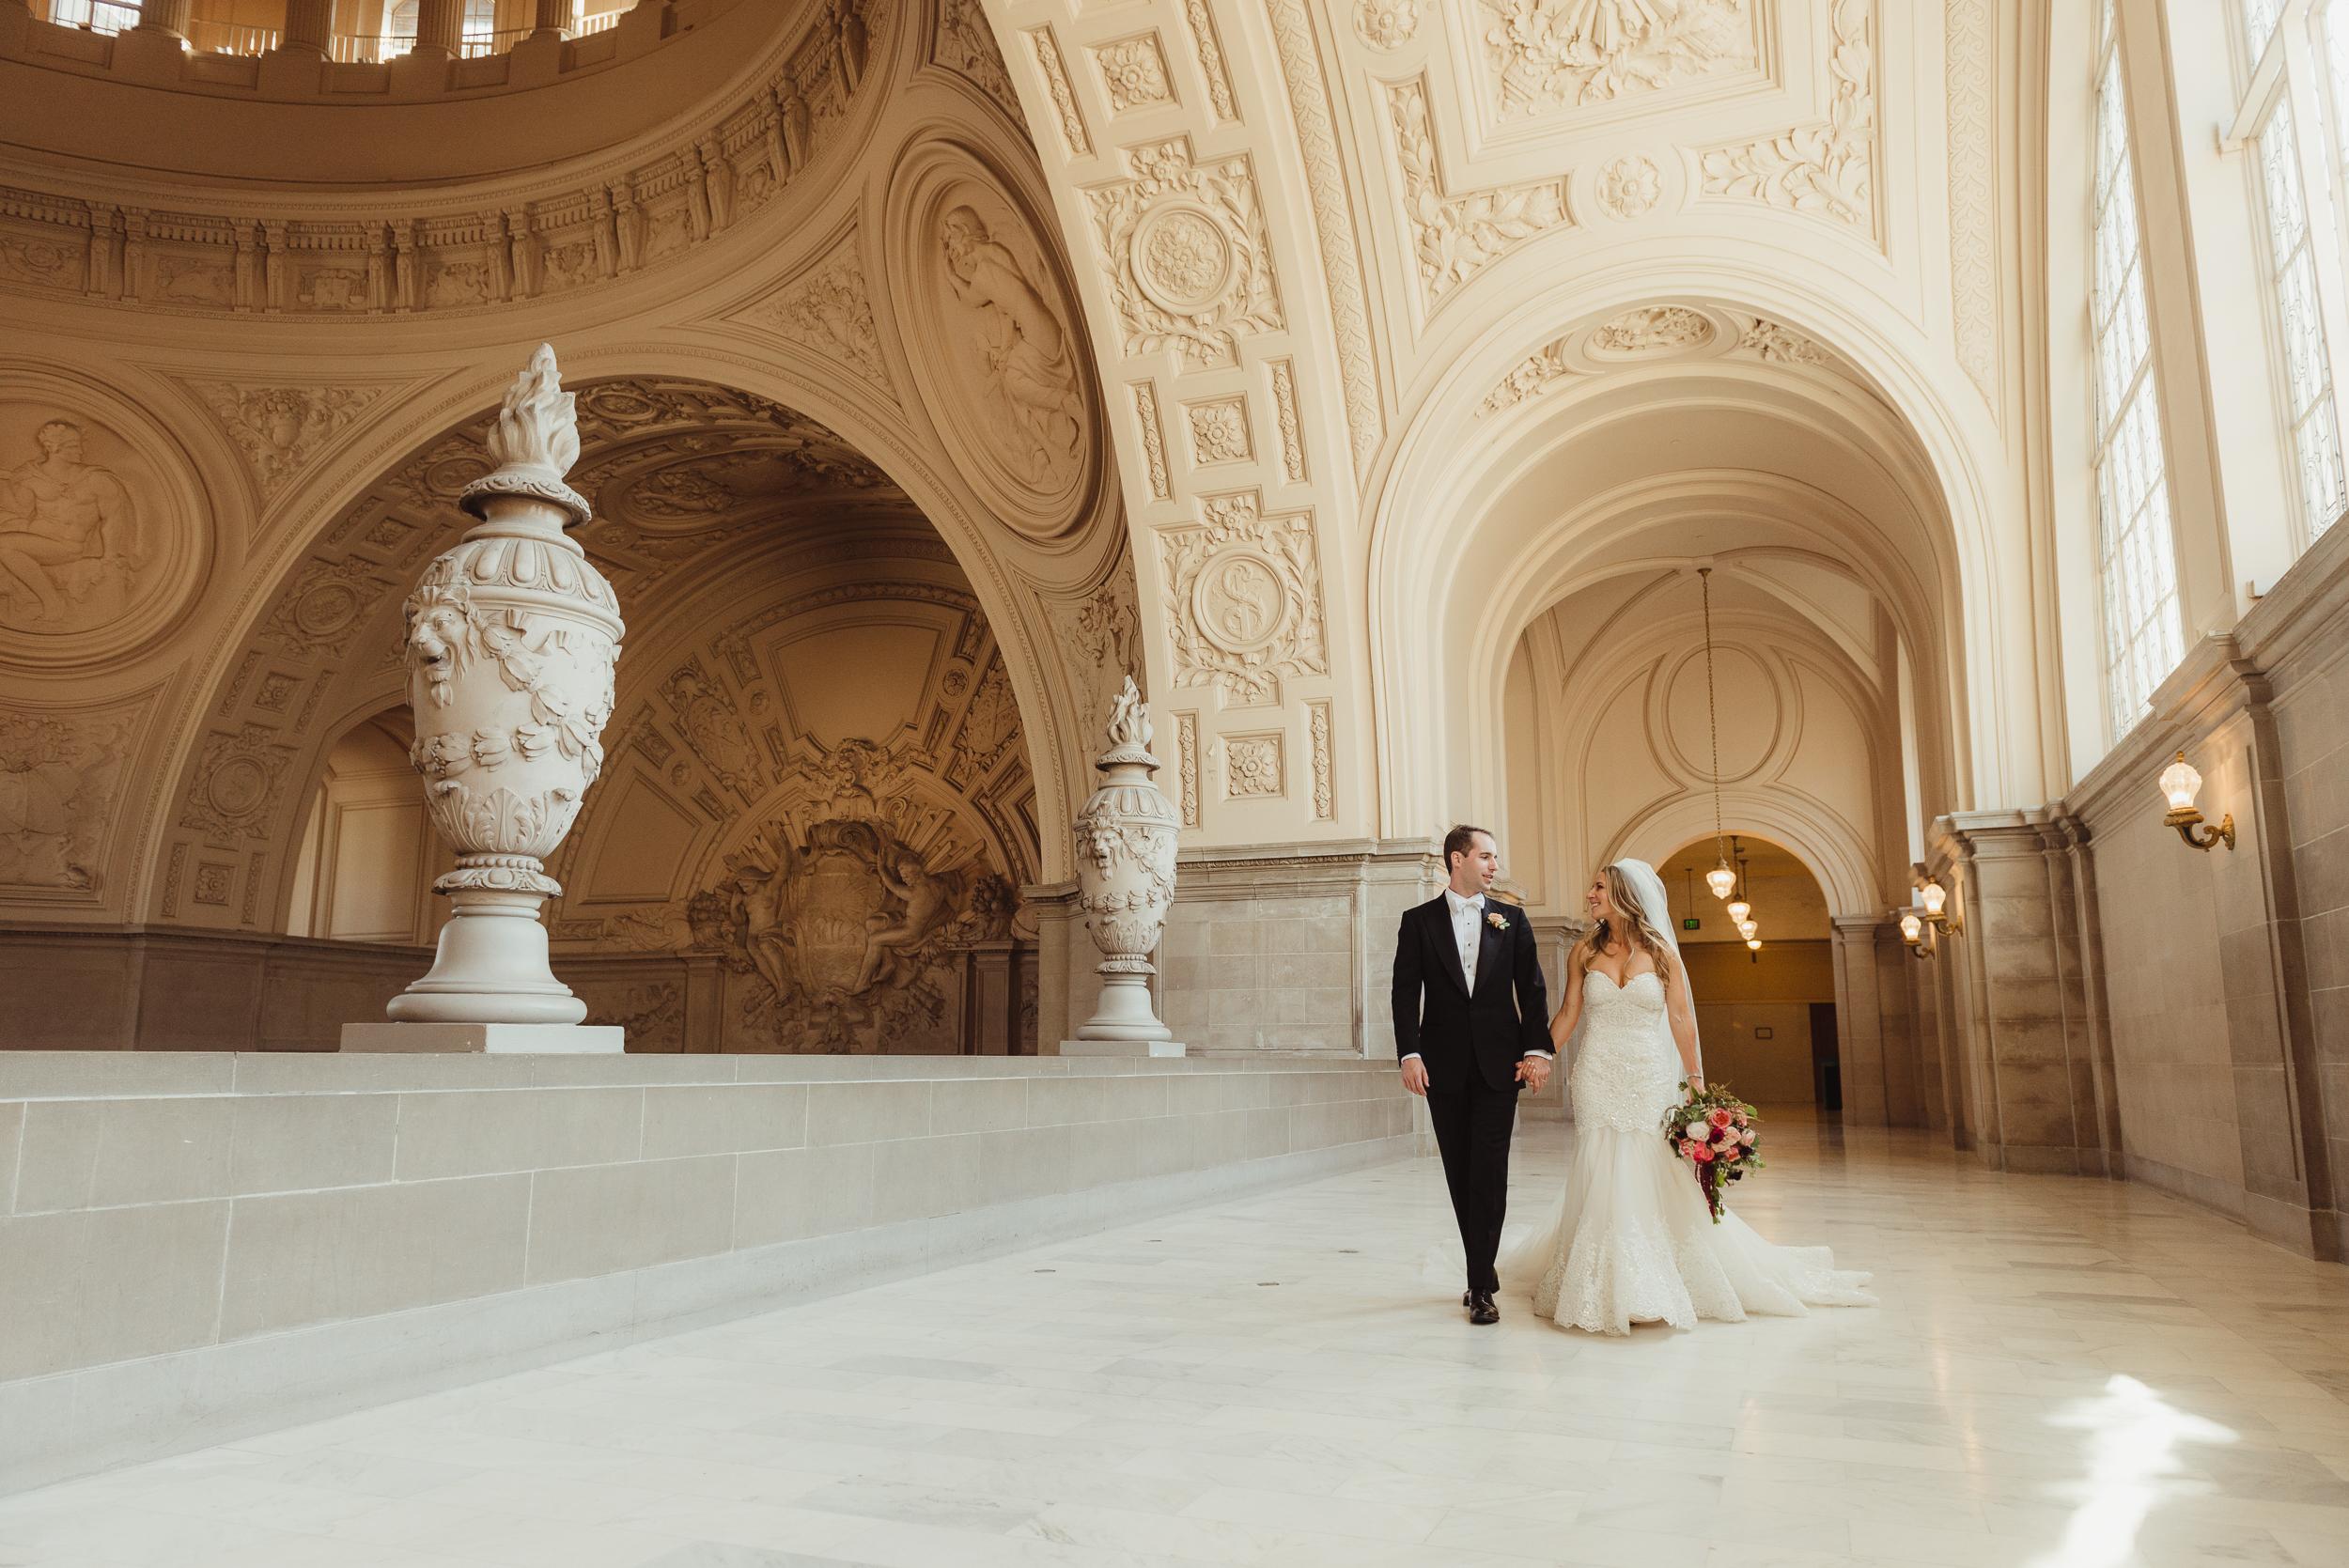 46-elegant-san-francisco-city-hall-wedding-vivianchen-0666.jpg